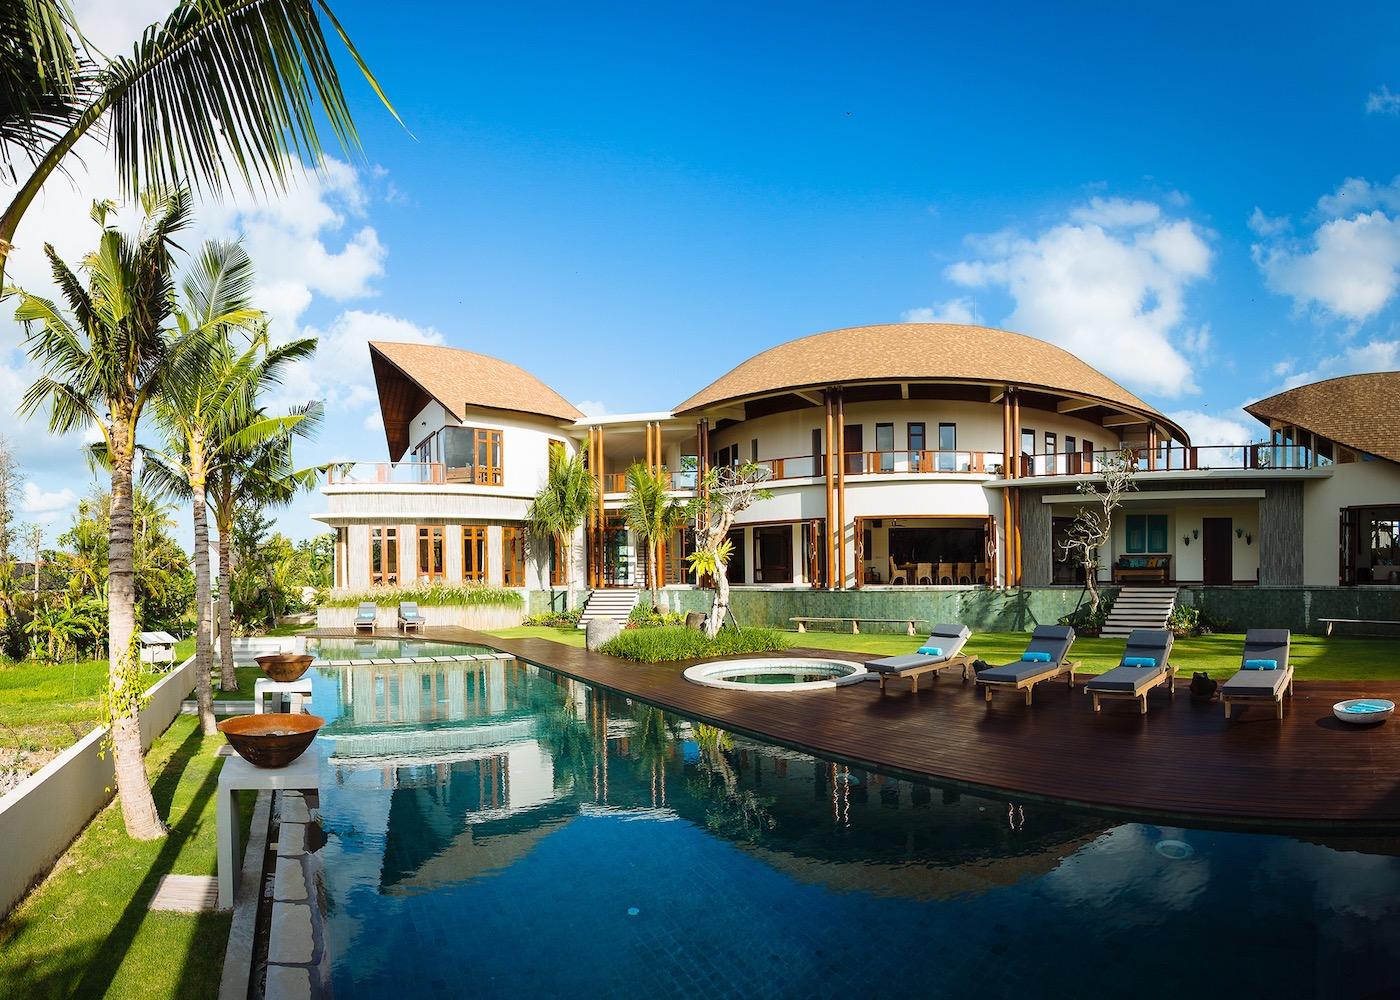 Villa Umah Daun in Umalas - the best family-friendly villas in Bali, Indonesia